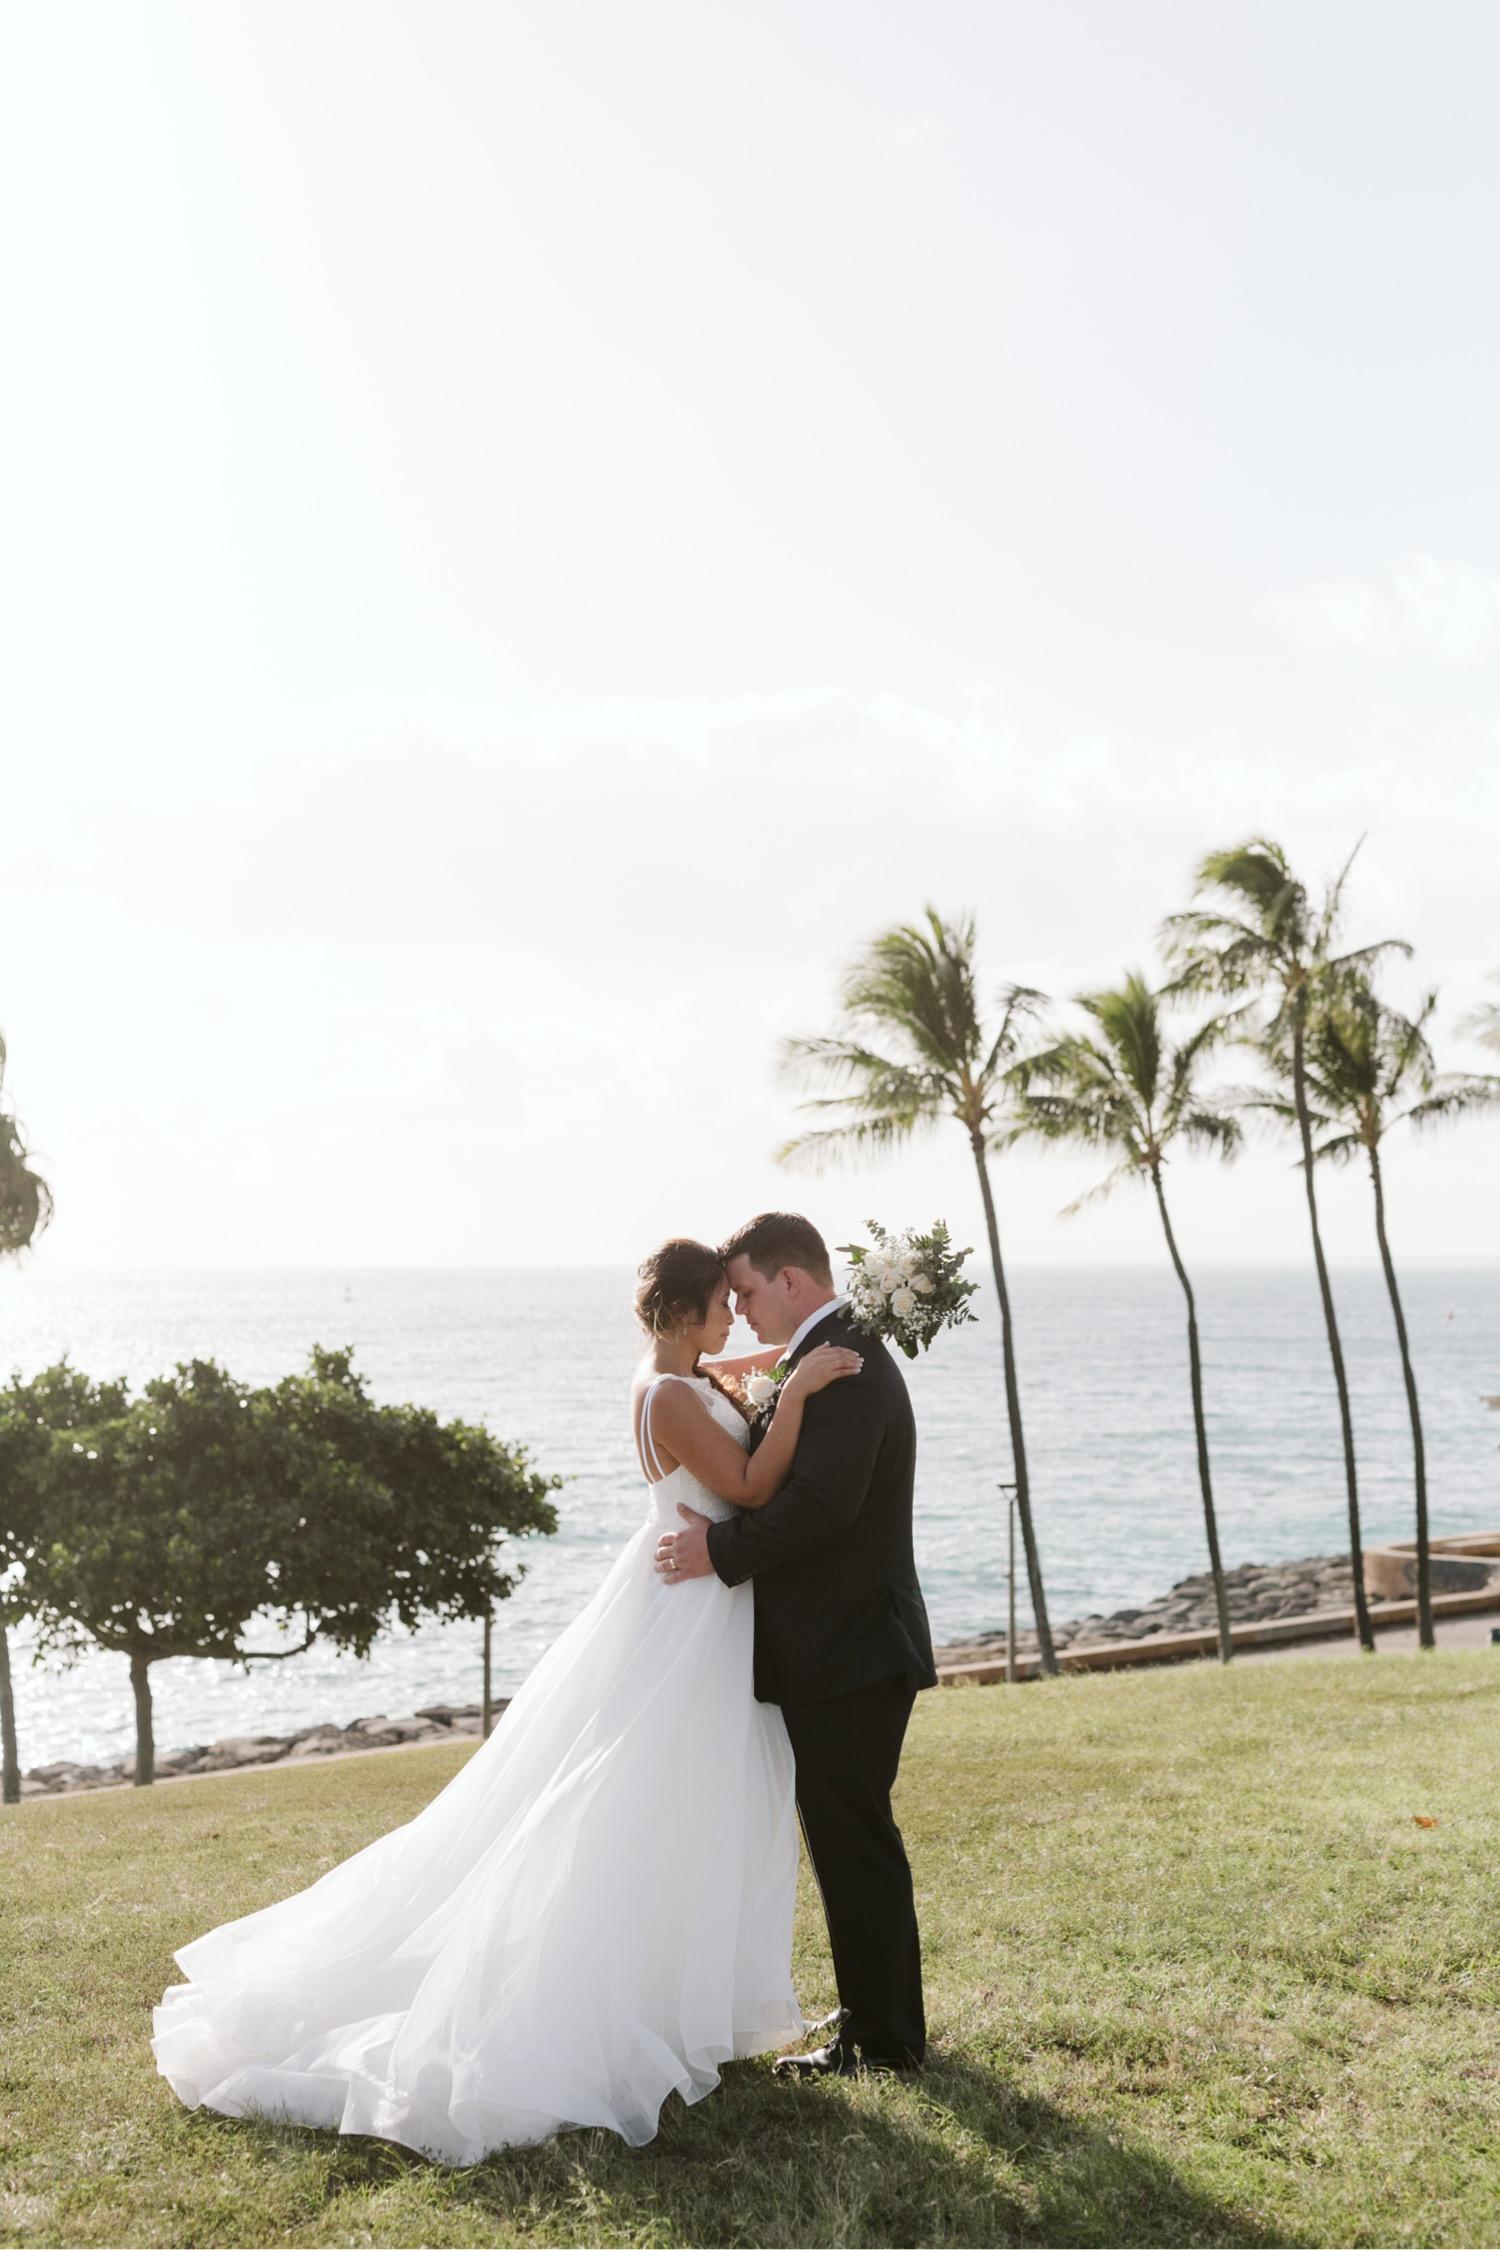 Julia_Groom_Hawaii_Waterfront_Bride_Wedding_Cafe_palm_trees_Honolulu_Kakaako.jpg